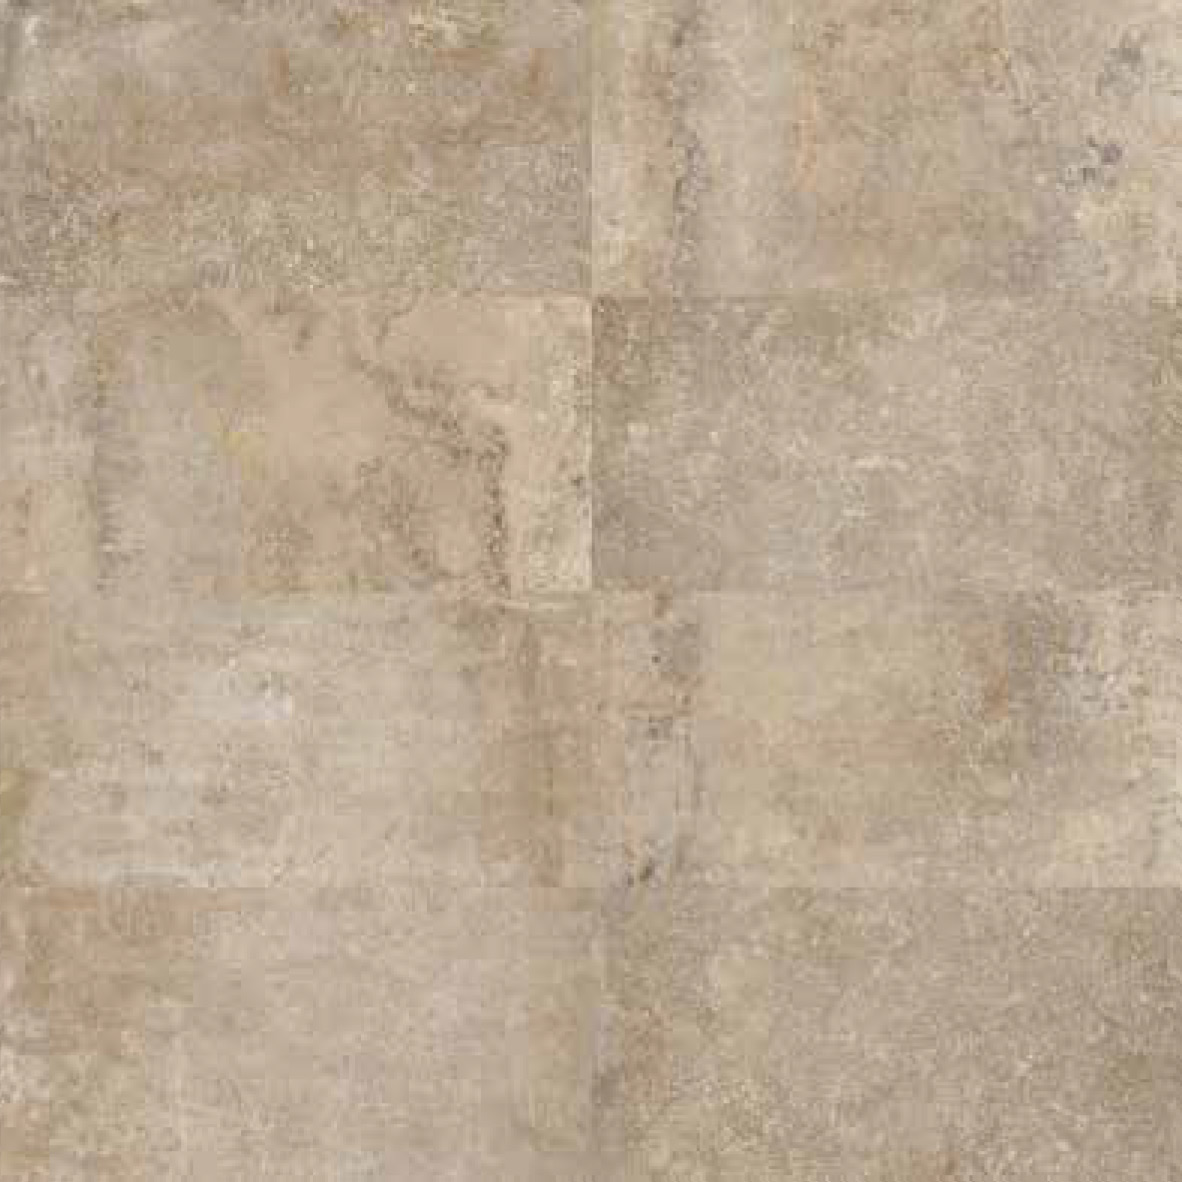 Castelvetro Always Corda 2593 Boden-/Wandfliese 60x60 Matt